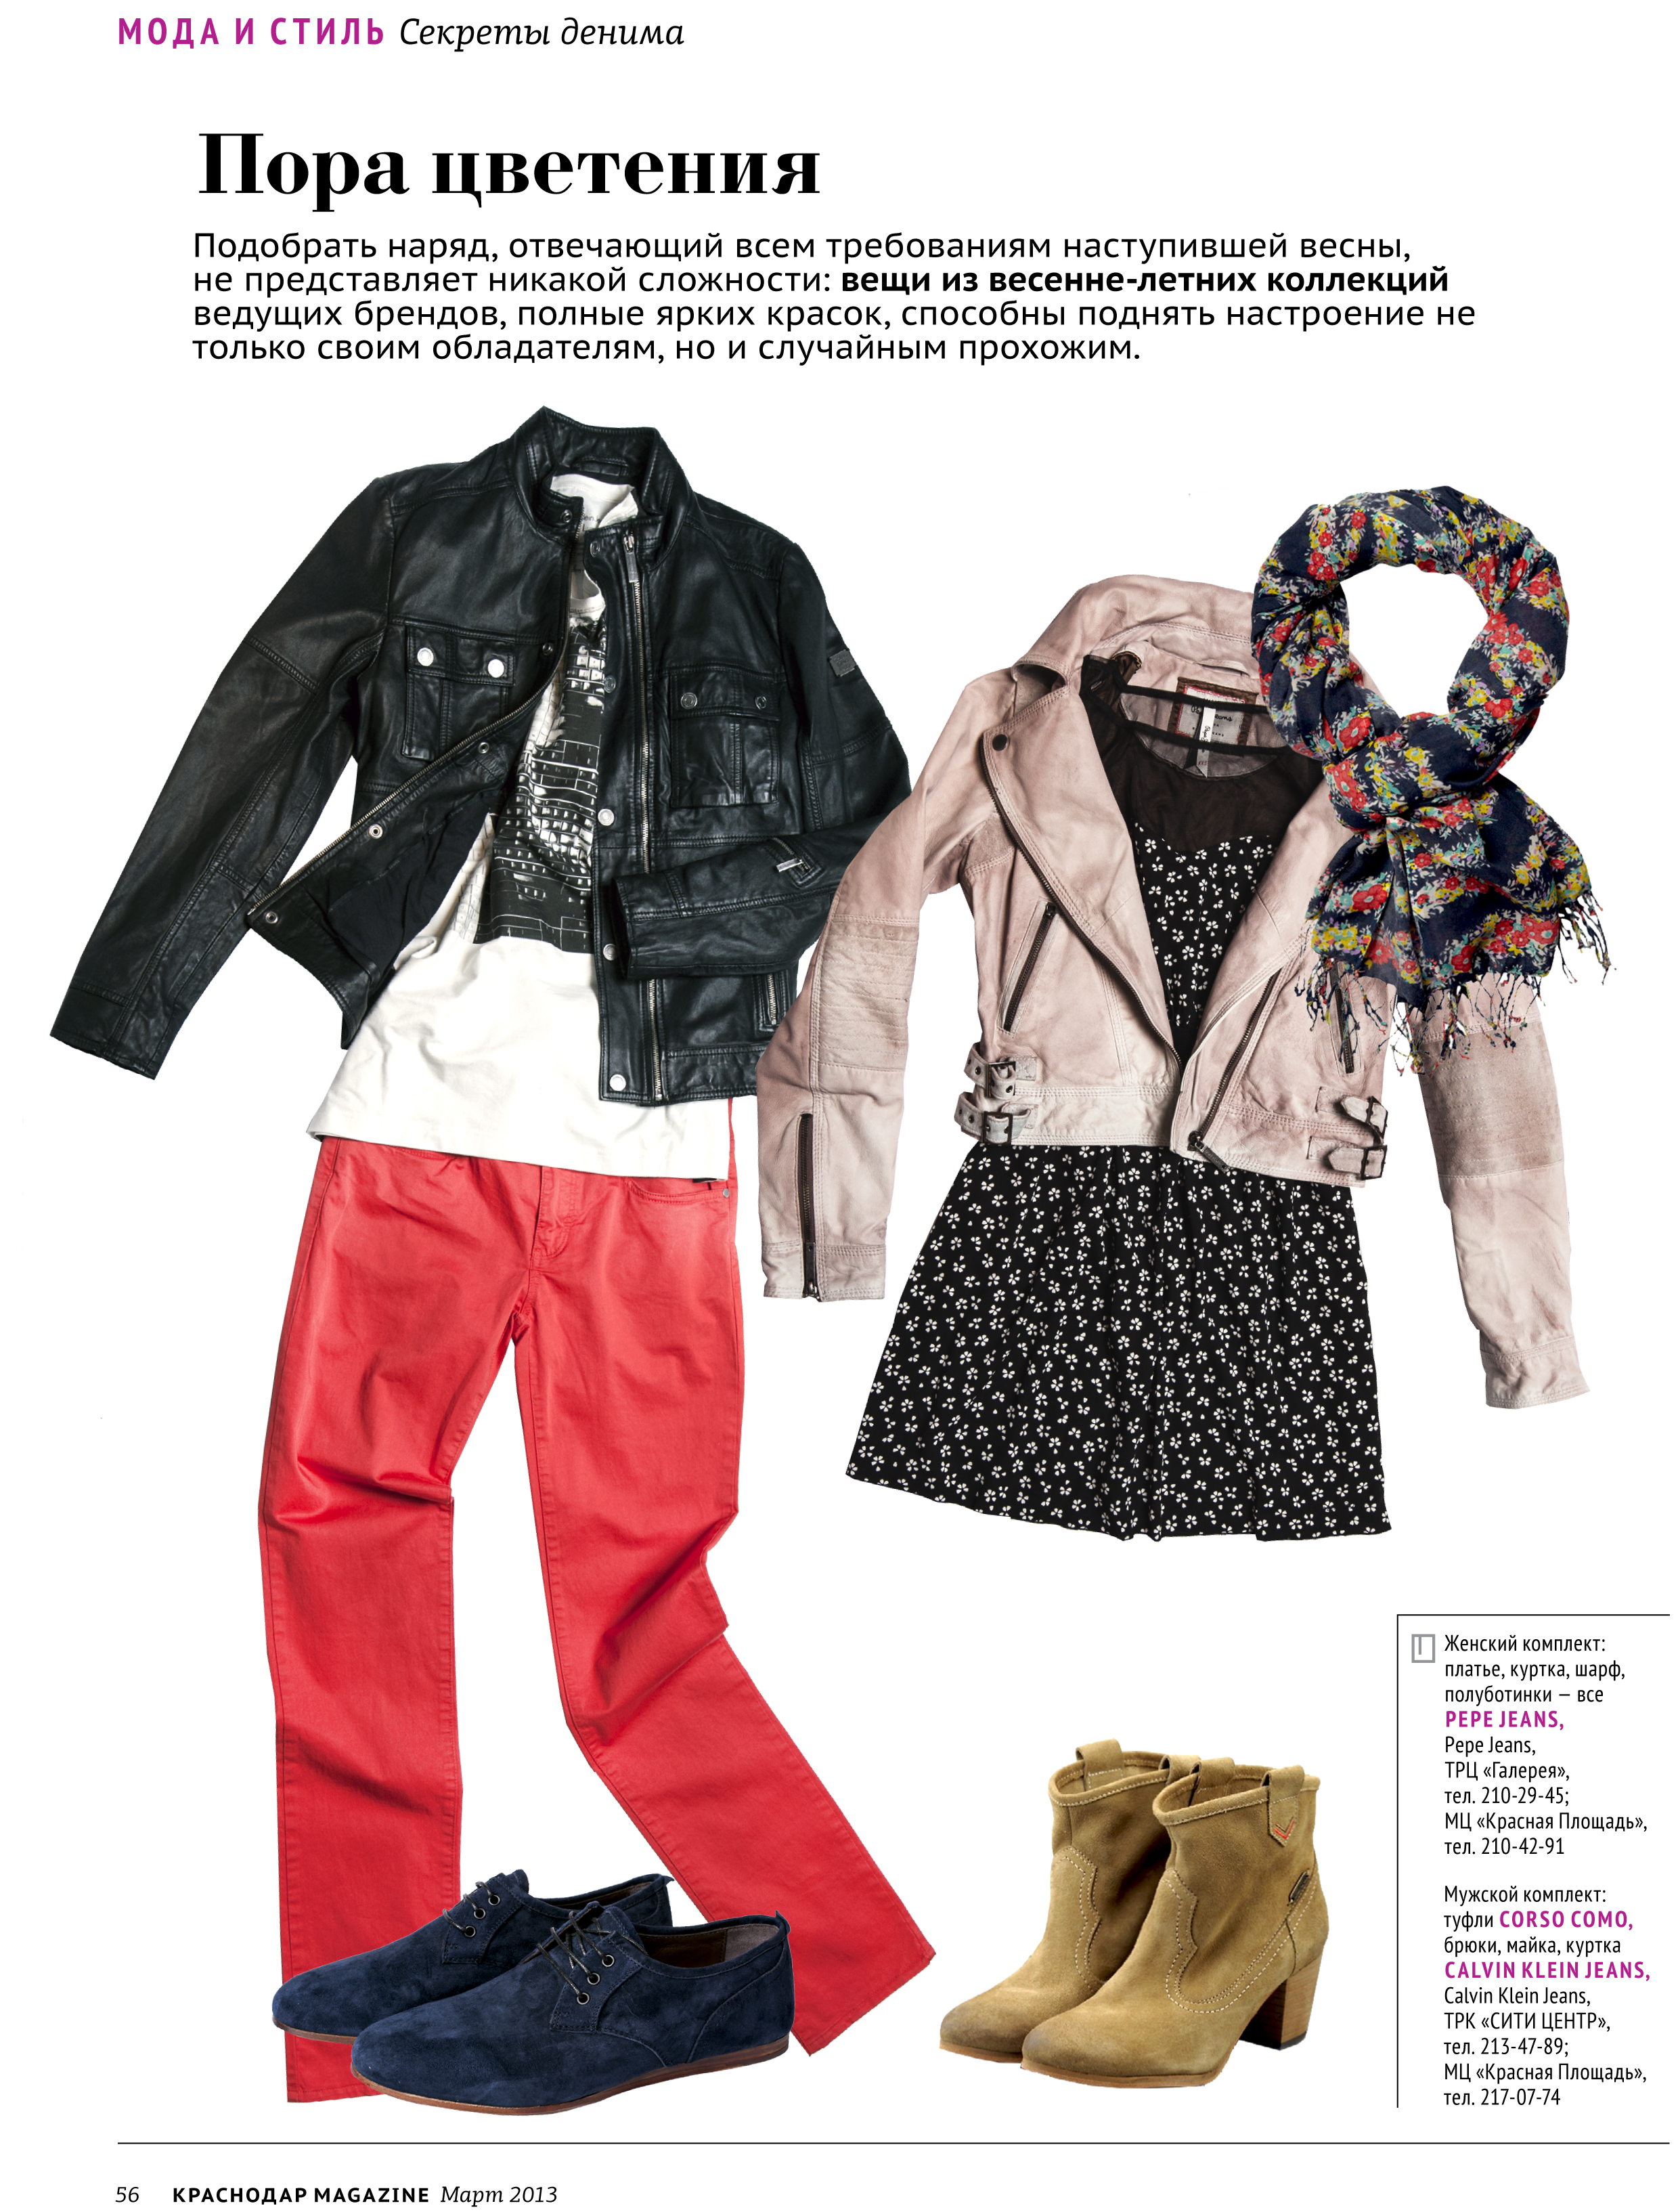 Moda&Stil'_Secreti Denima.jpg